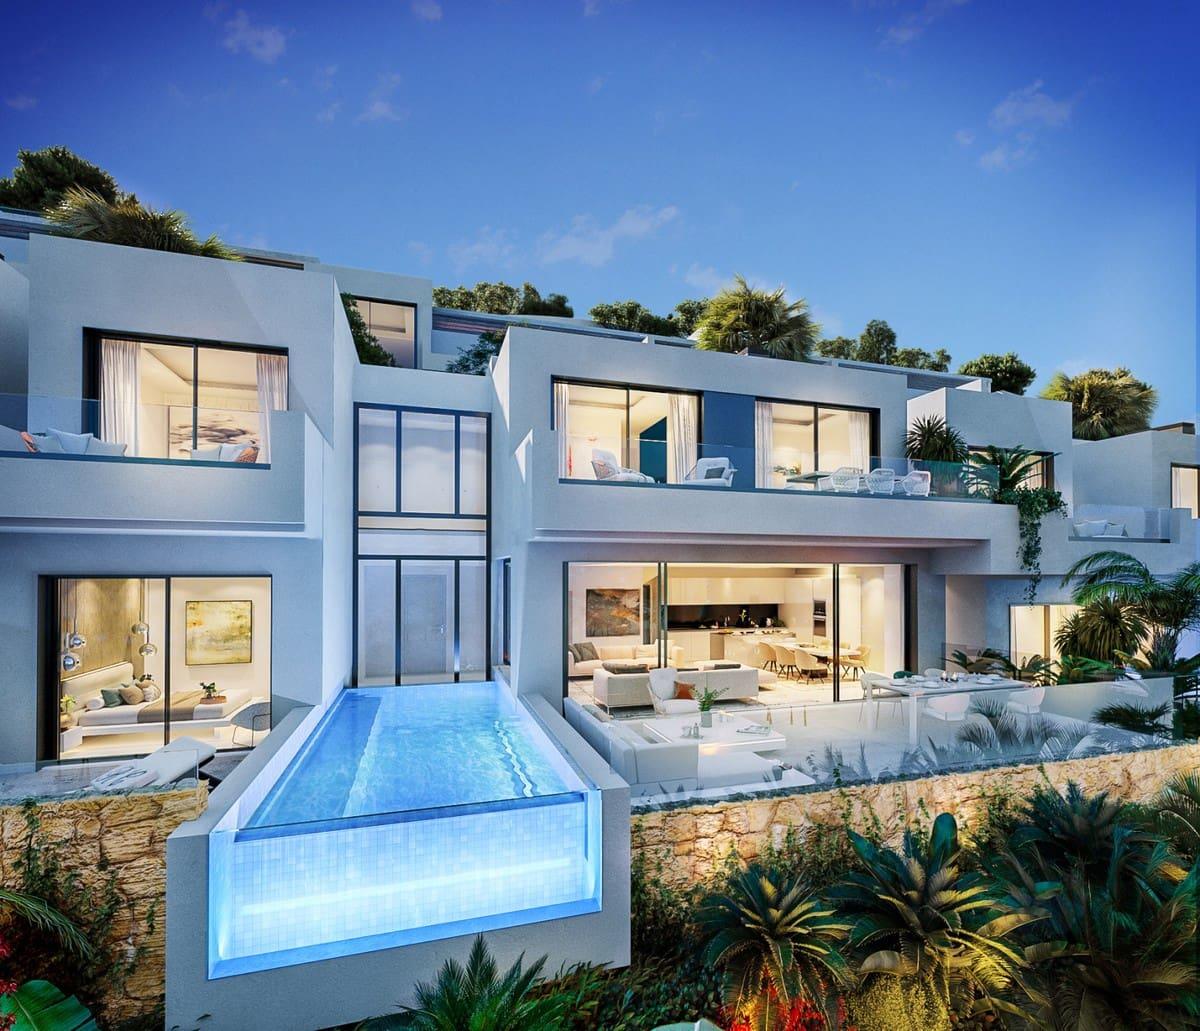 4 bedroom Villa for sale in Benalmadena with pool garage - € 899,000 (Ref: 4954294)